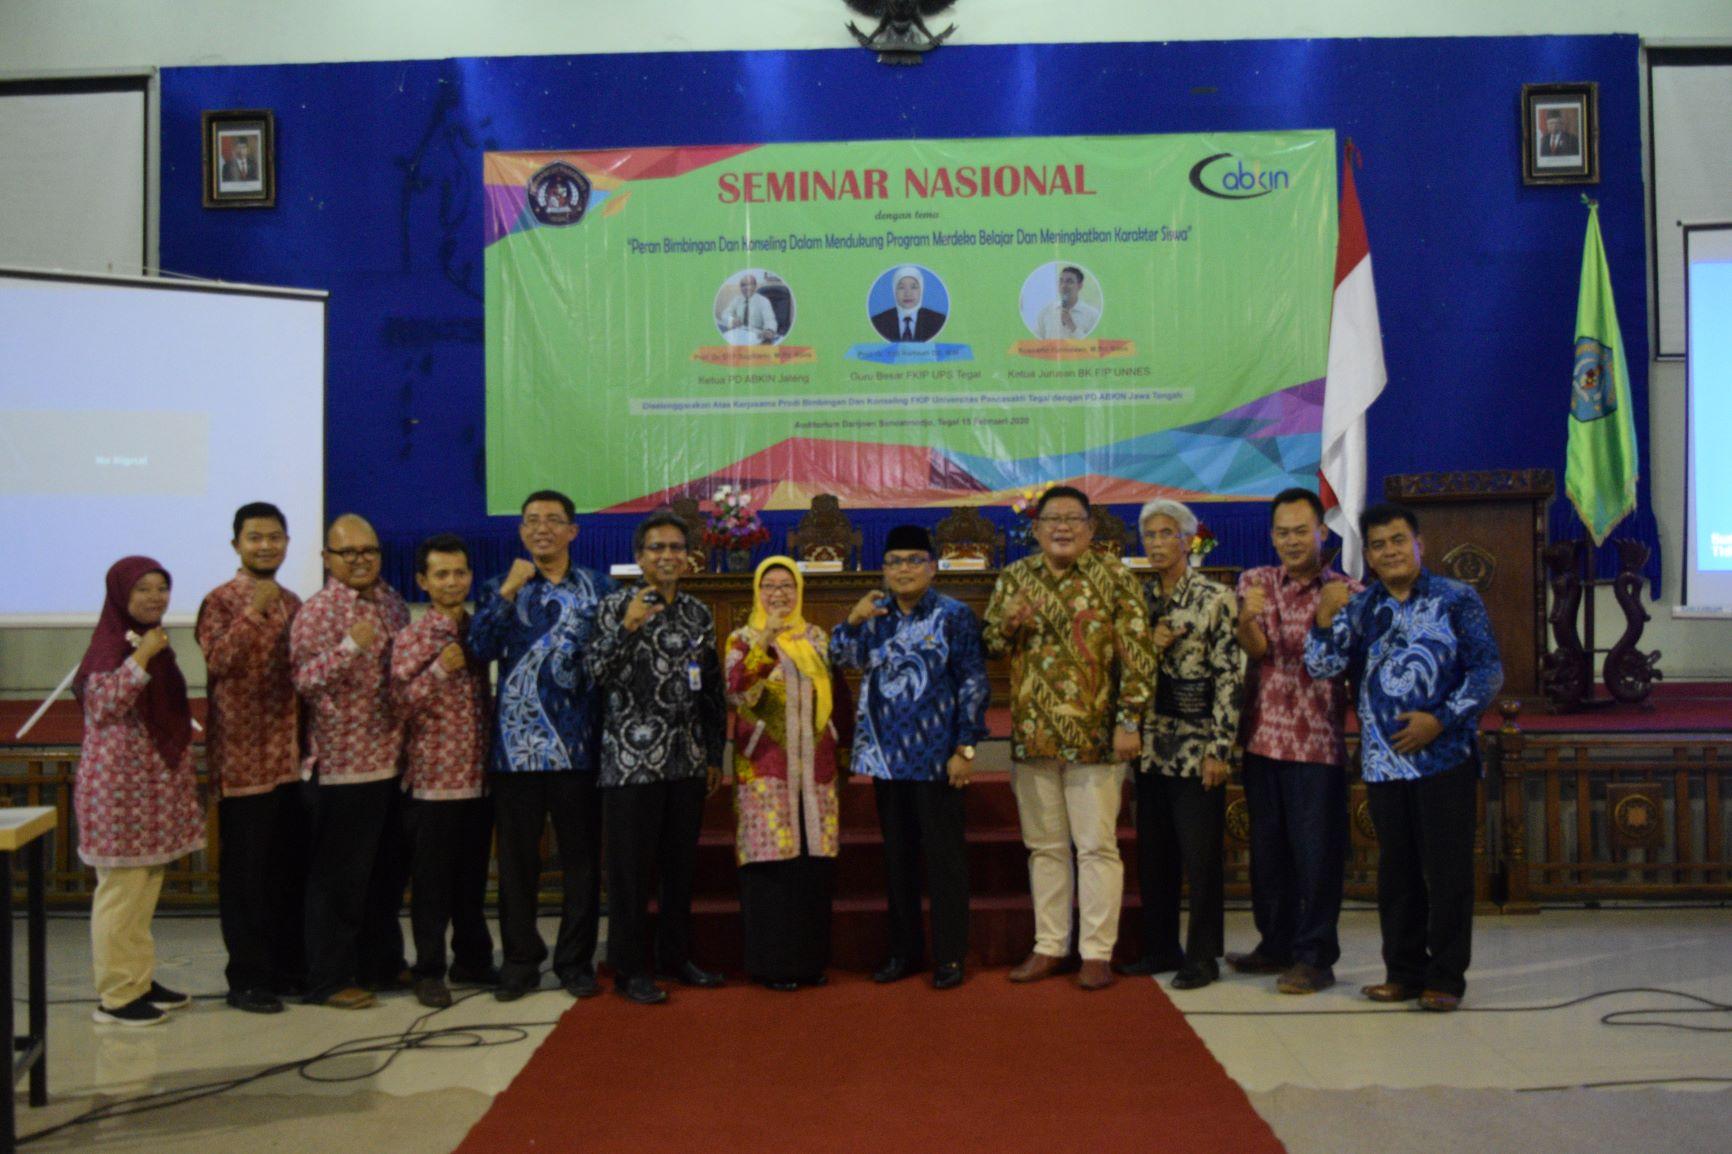 Seminar Nasional Prodi Bimbingan dan Konseling & MOU kerja sama BK UPS dengan PD ABKIN JATENG